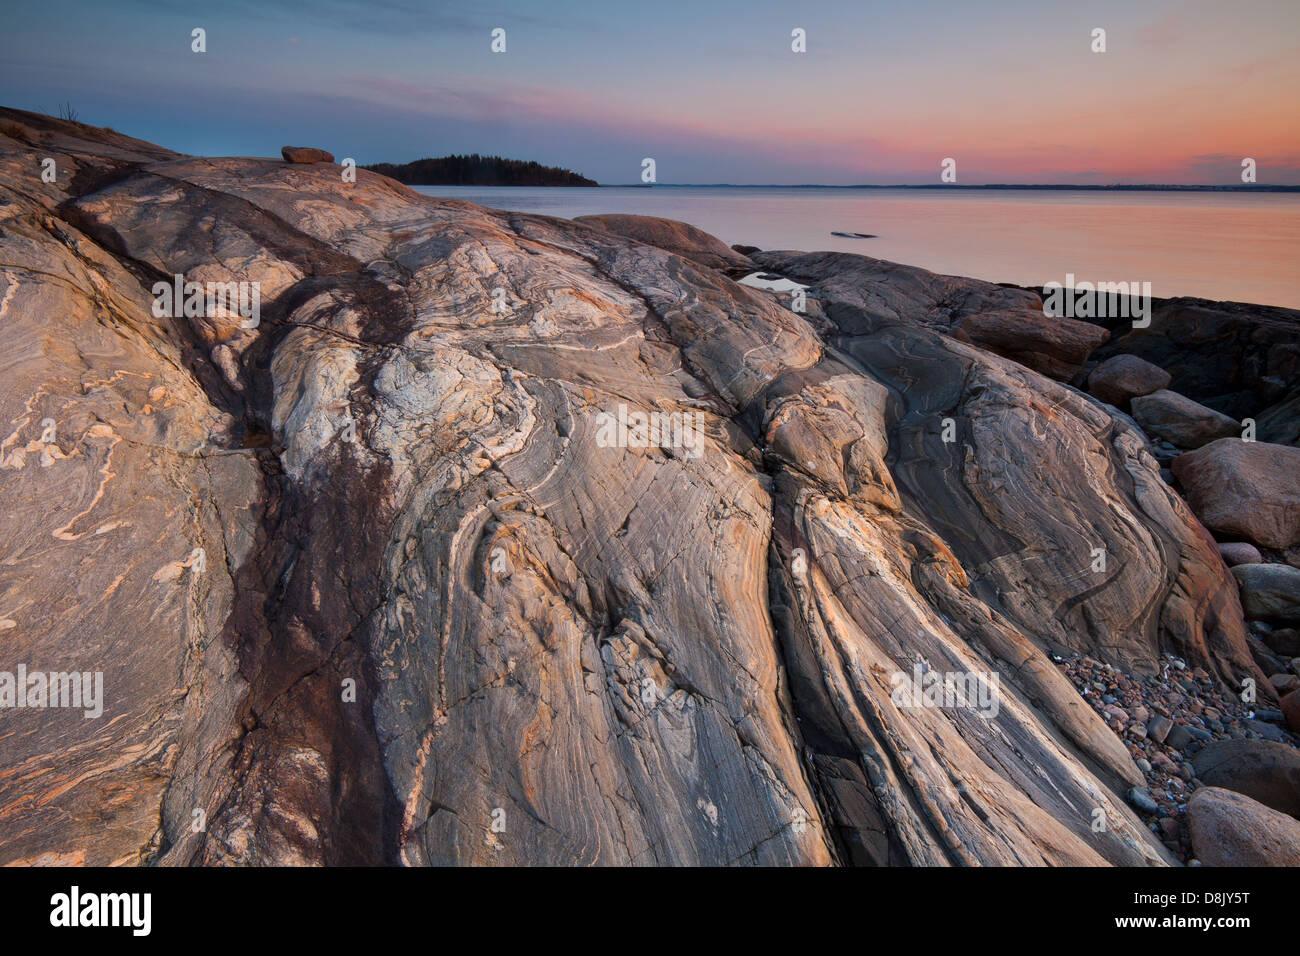 Formaciones de roca en Botnerbaugen en Larkollen, Rygge kommune, Østfold fylke, Noruega. Foto de stock